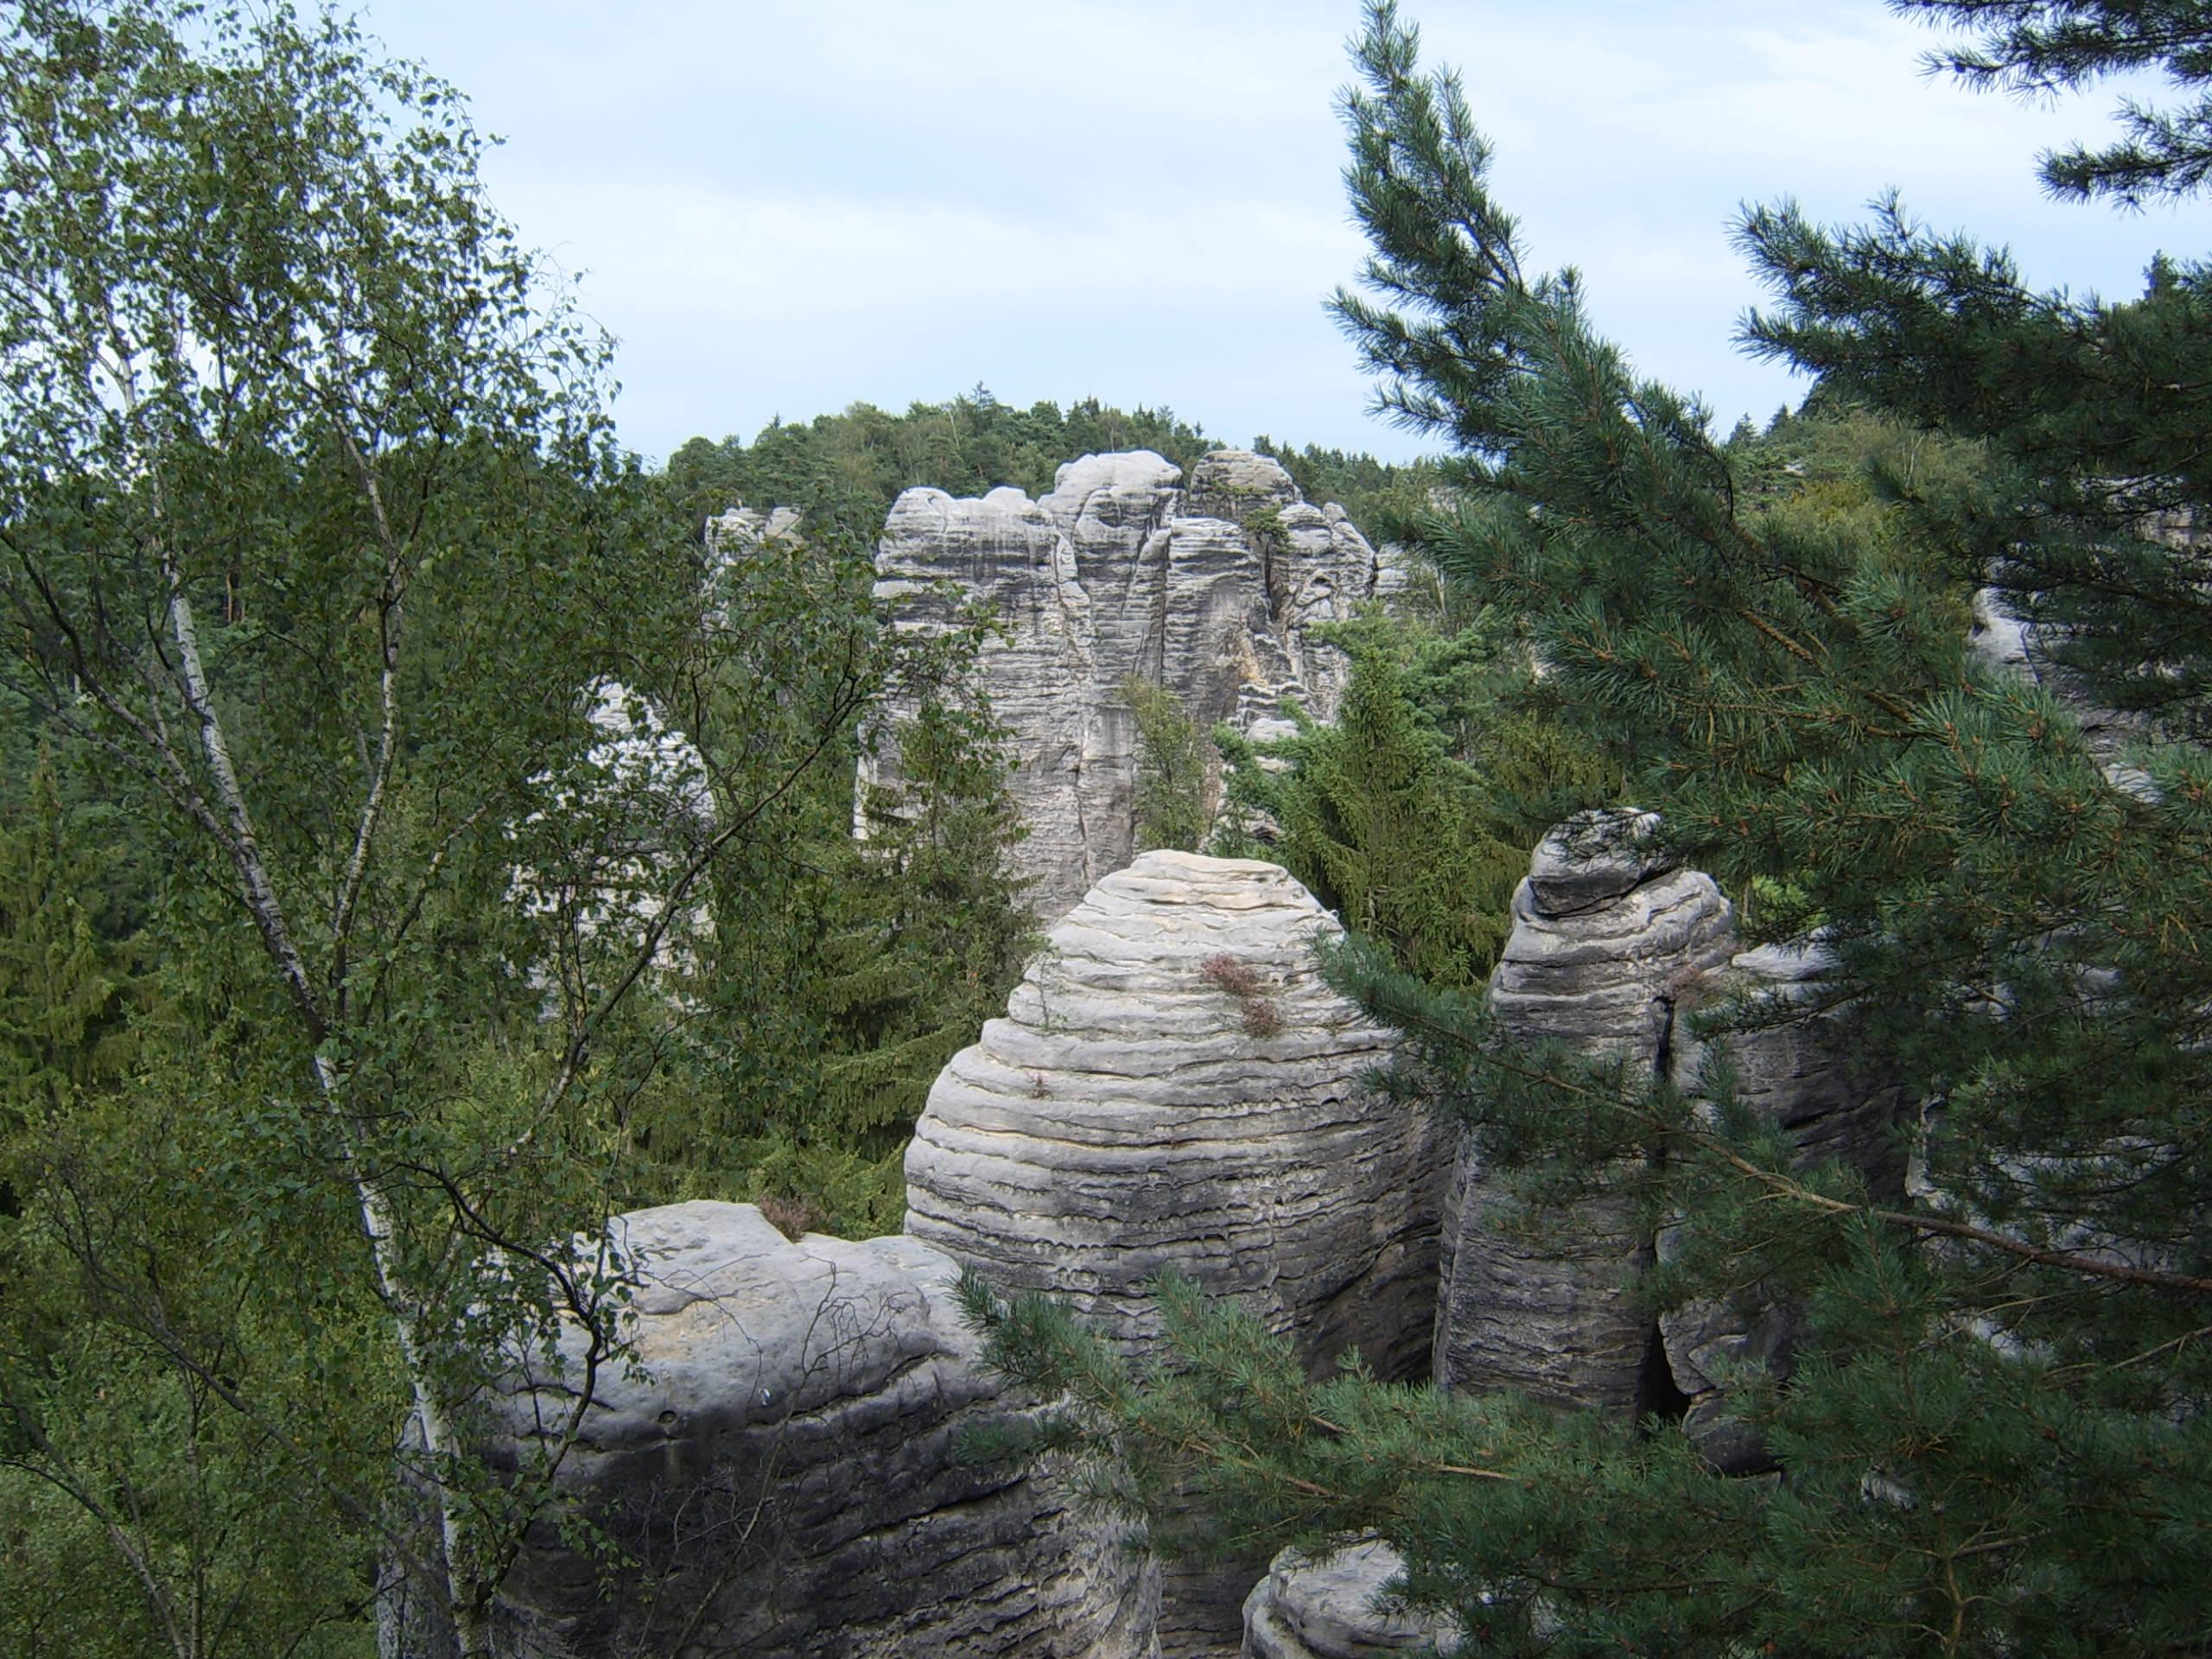 Sedmihorky, Valdštejn, Hrubá Skála, Trosky